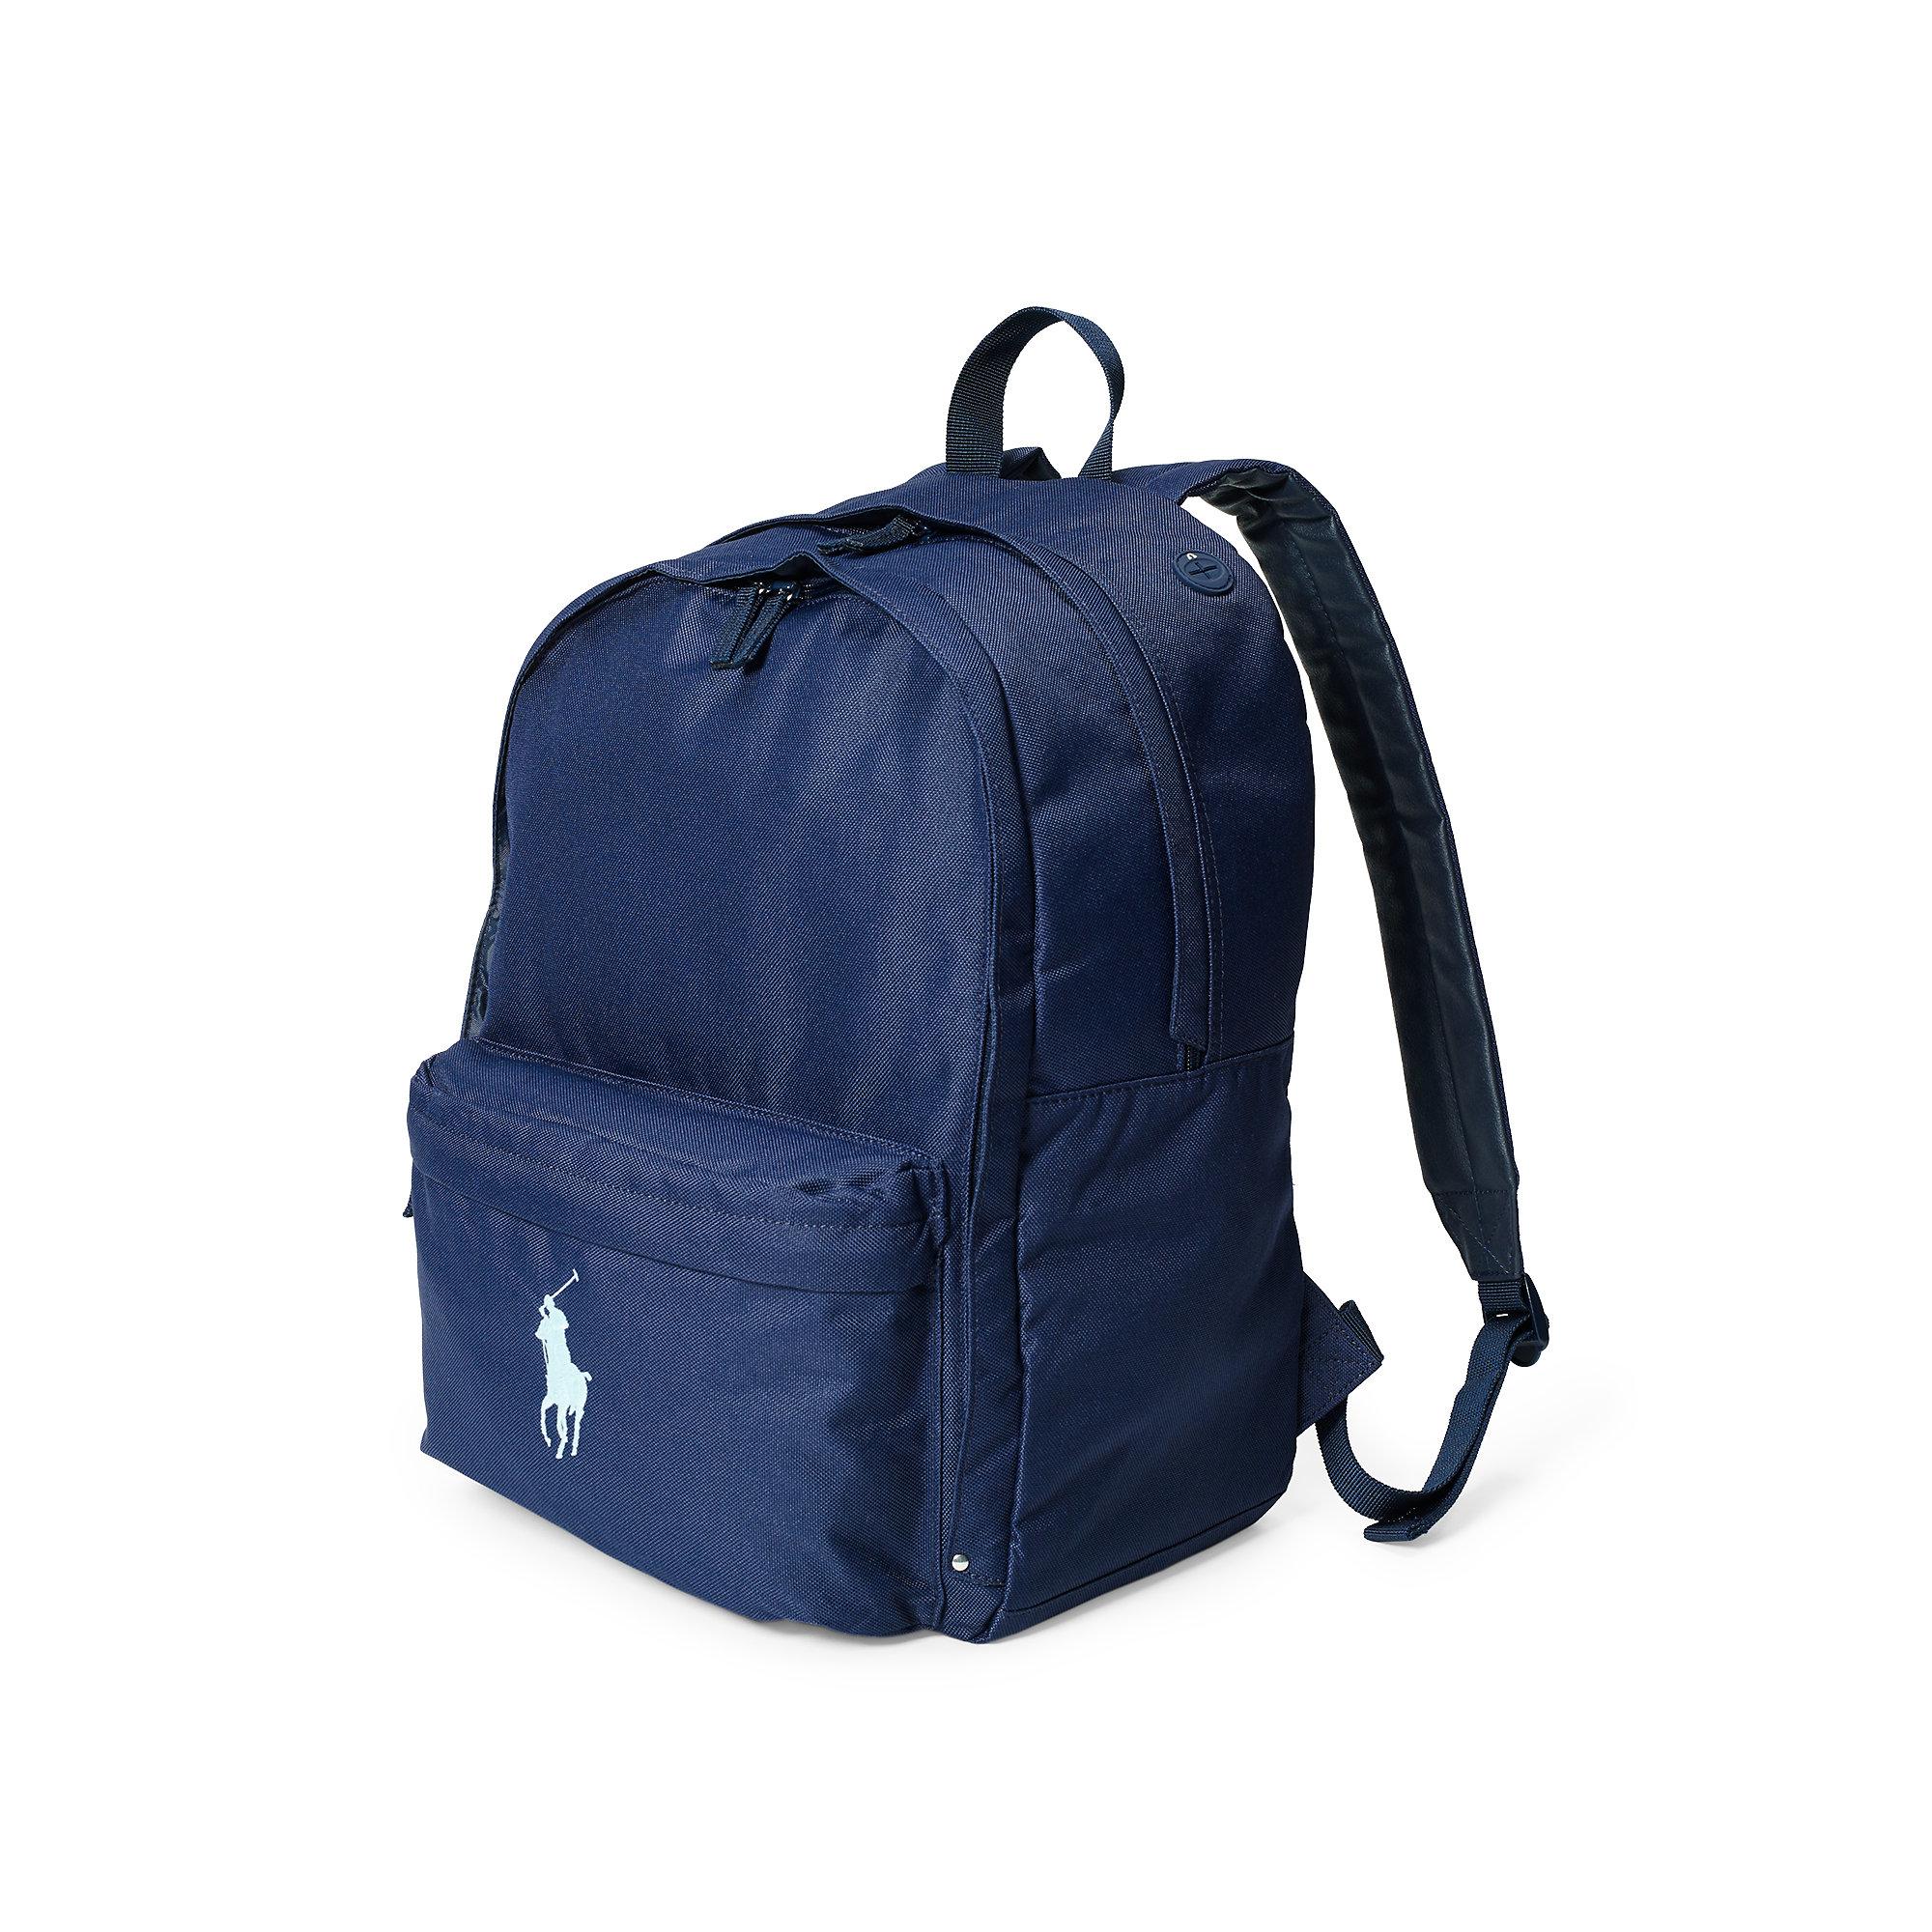 Lyst - Ralph Lauren Large Big Pony Backpack in Blue 7b48da3acb7b0